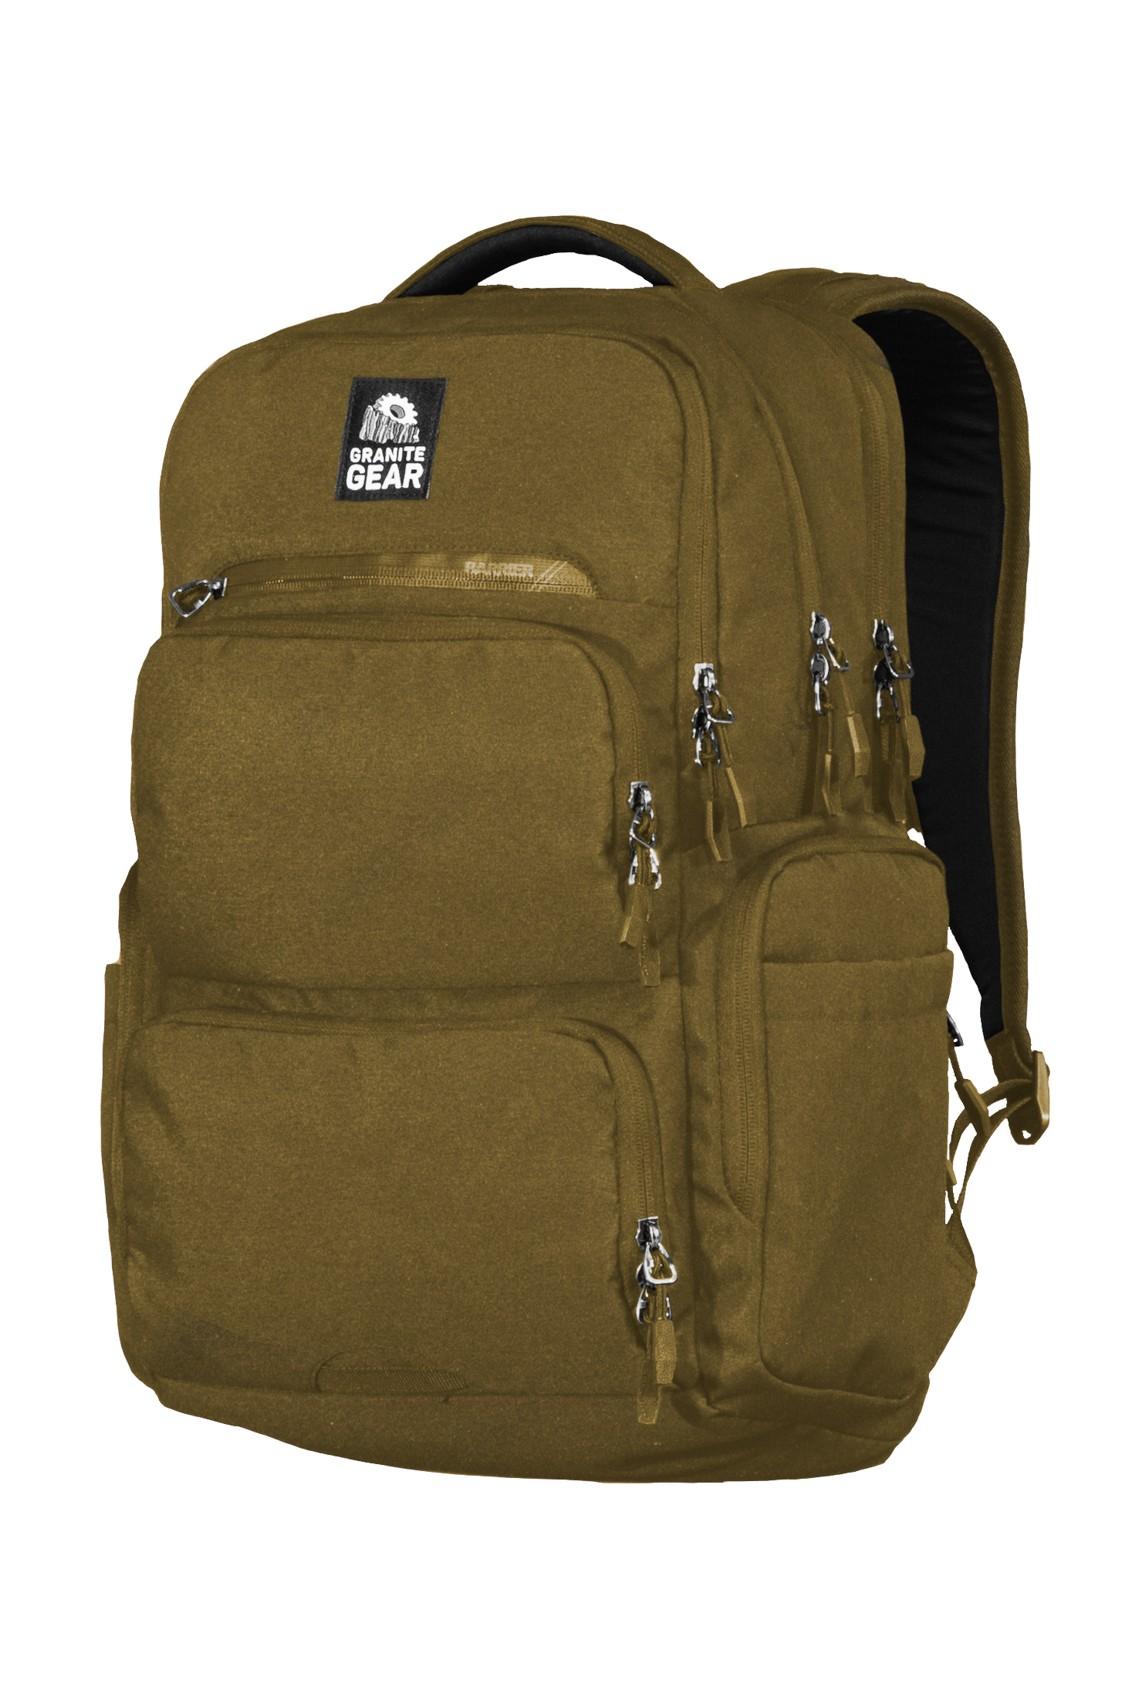 Two Harbors College Backpacks Granite Gear